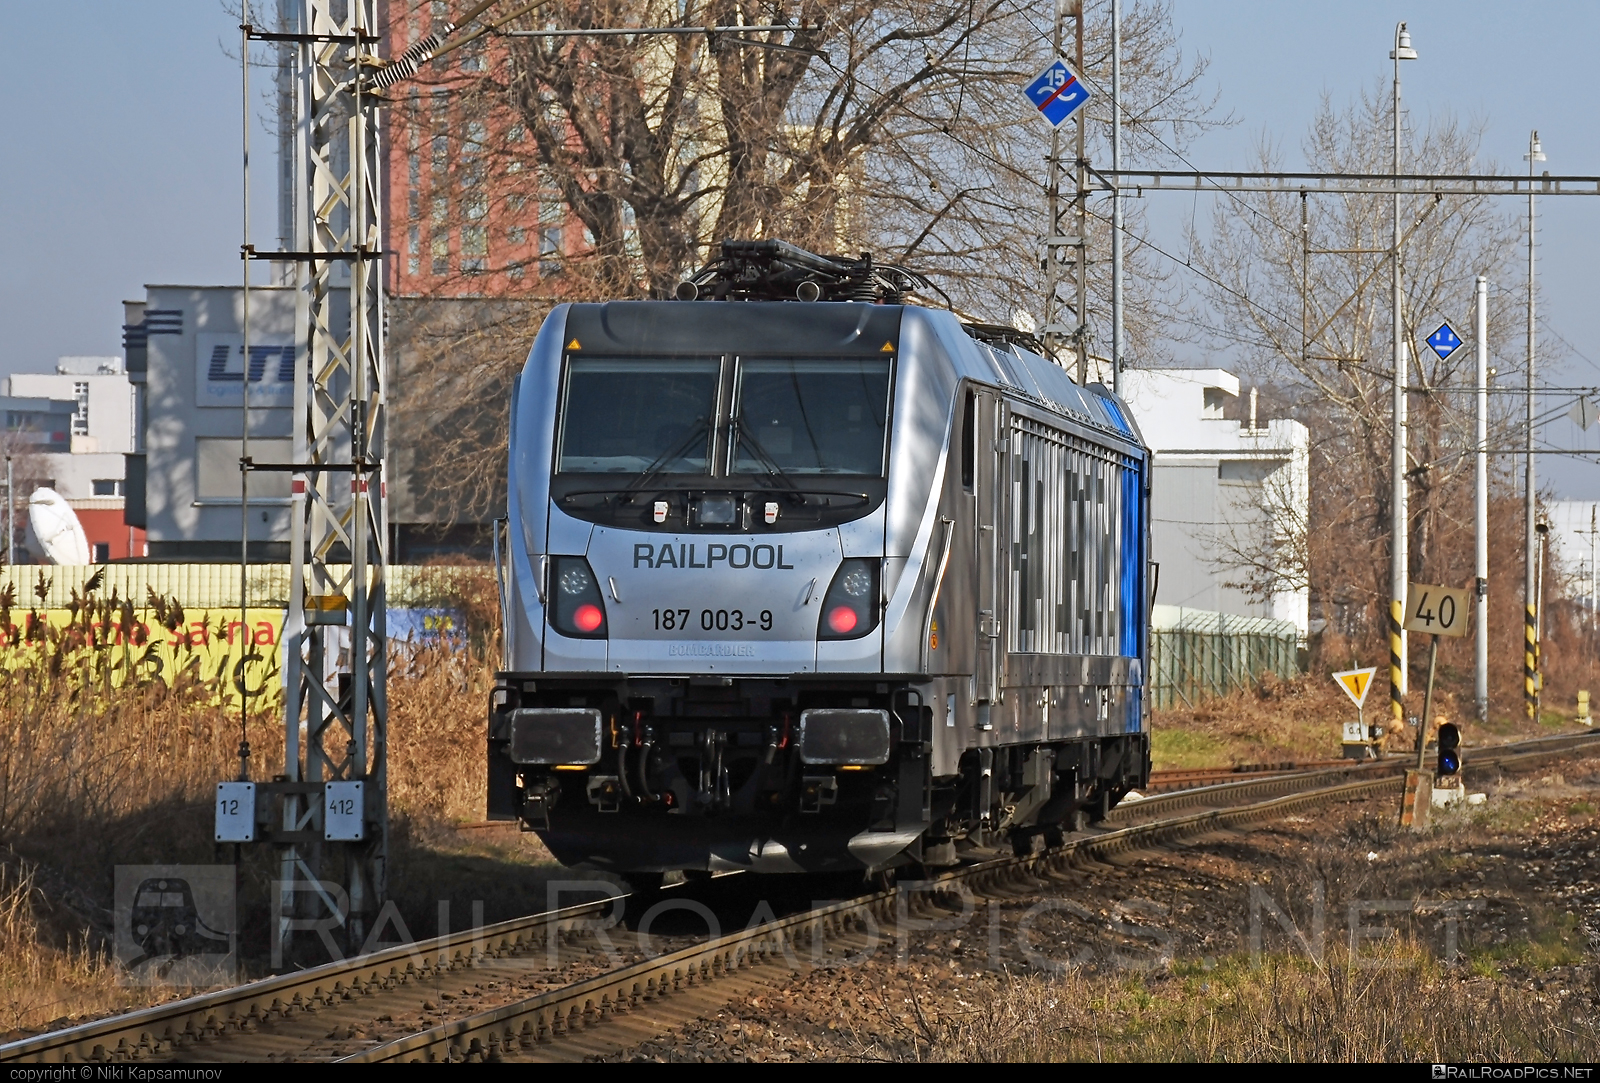 Bombardier TRAXX F160 AC3 - 187 003-9 operated by ČD Cargo, a.s. #bombardier #bombardiertraxx #cdcargo #cdcargoniederlassungwien #railpool #railpoolgmbh #traxx #traxxf160 #traxxf160ac #traxxf160ac3